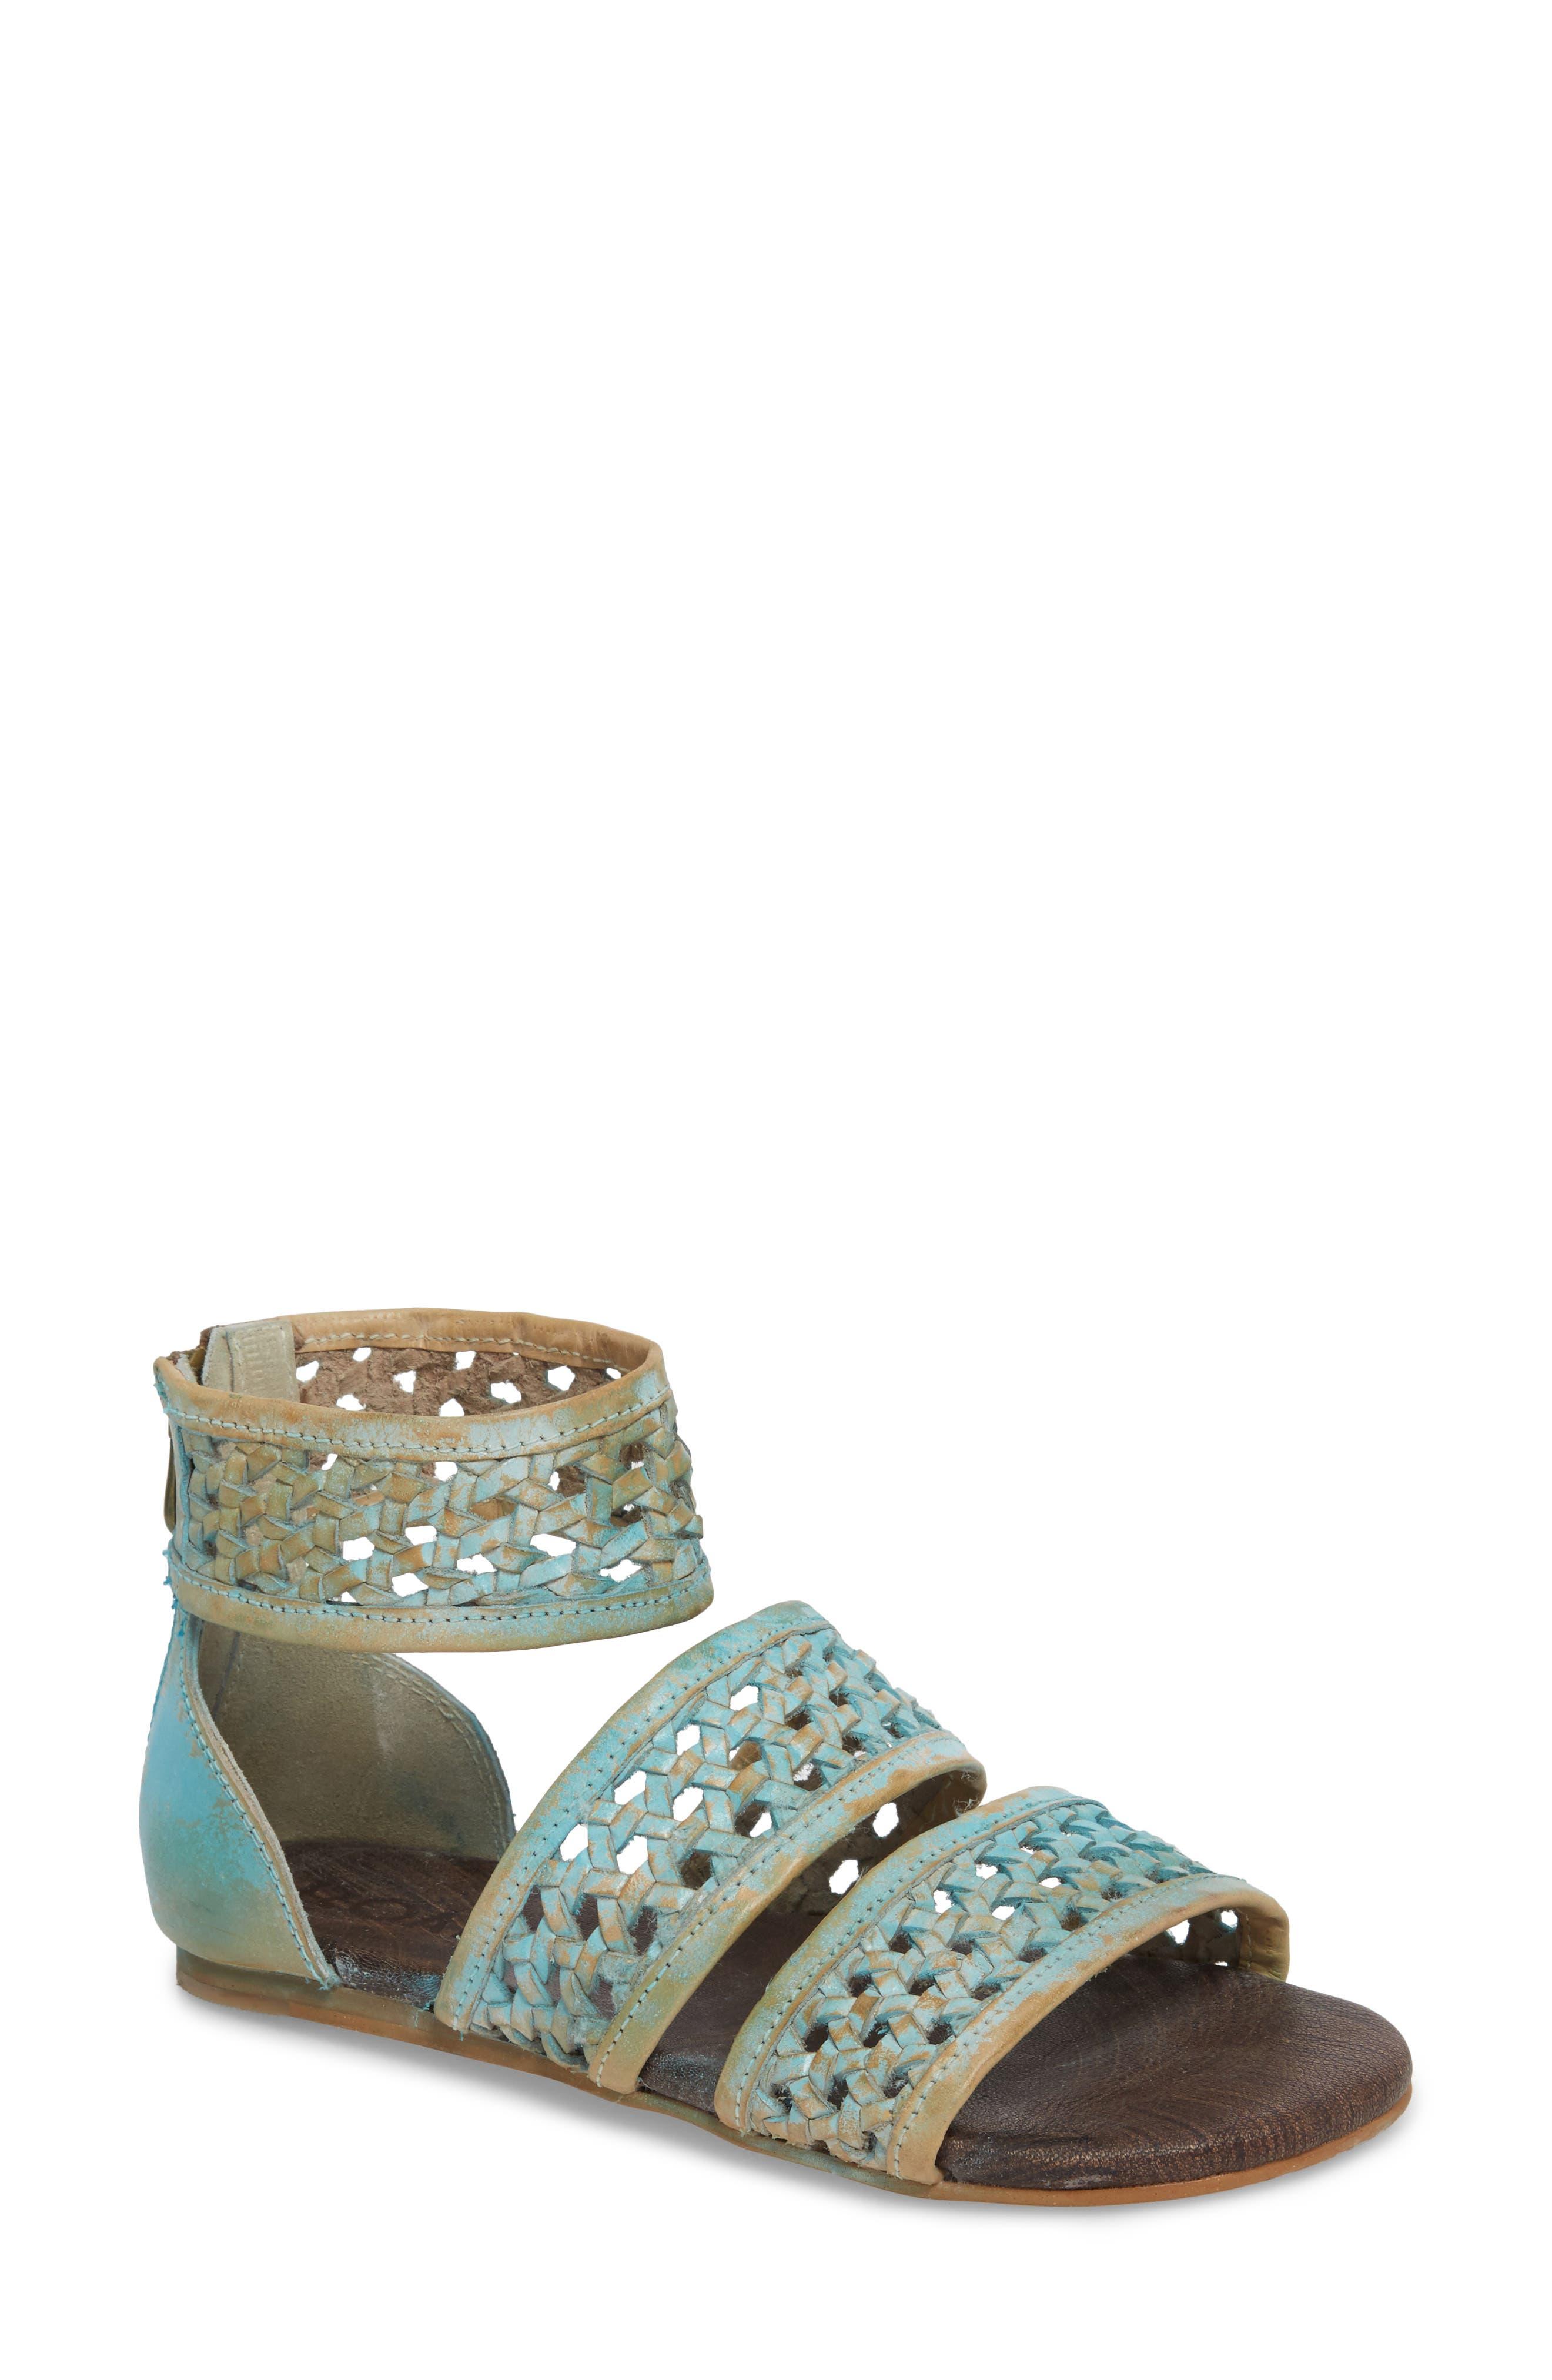 Clio Woven Ankle Cuff Sandal,                             Main thumbnail 1, color,                             Blue